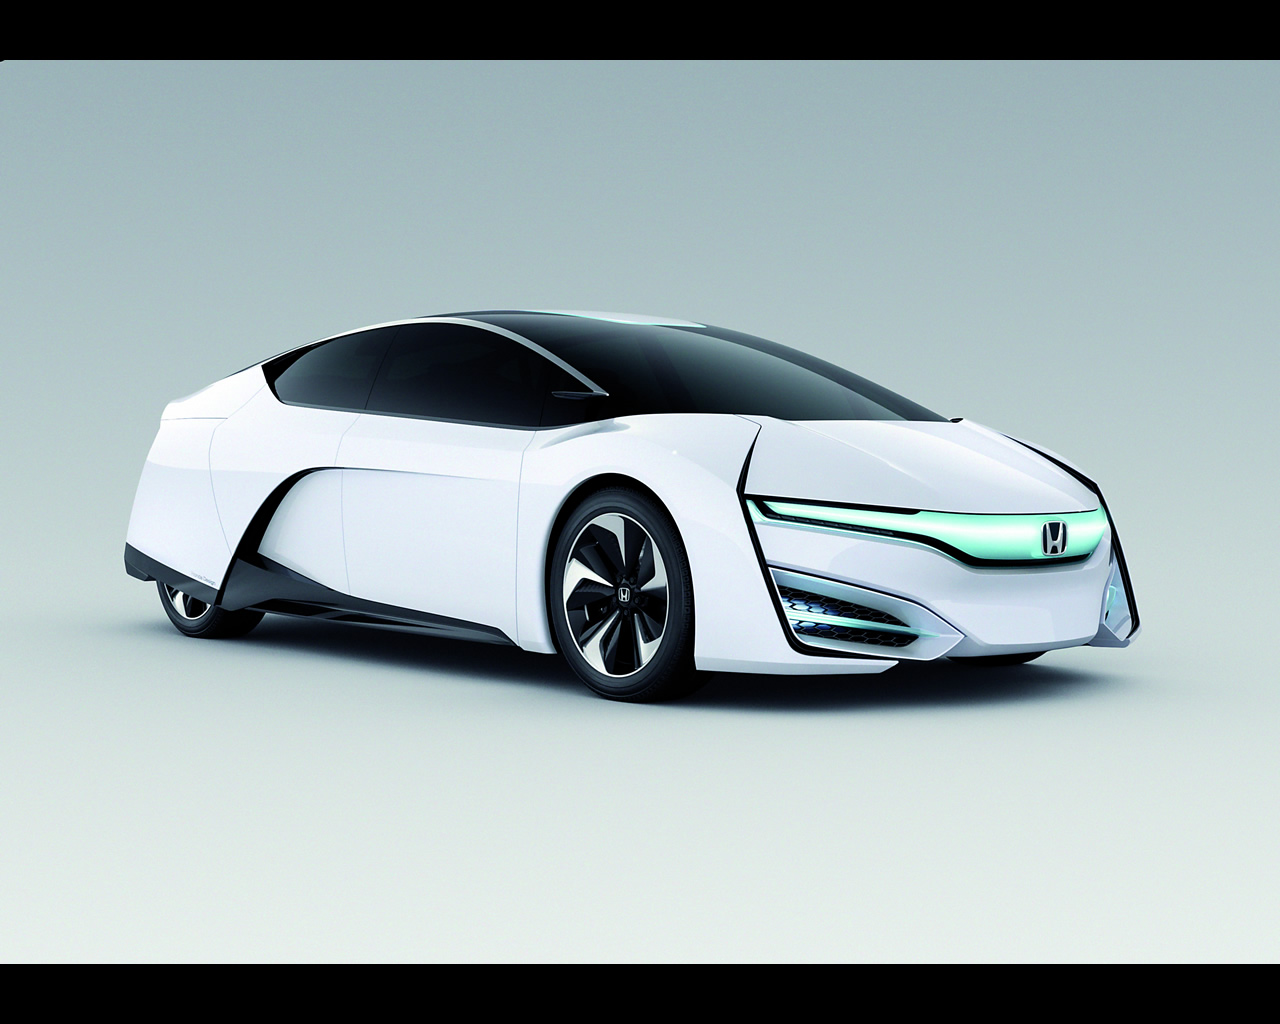 Honda FCV Hydrogen Fuel Cell Vehicle Design Study for 2015